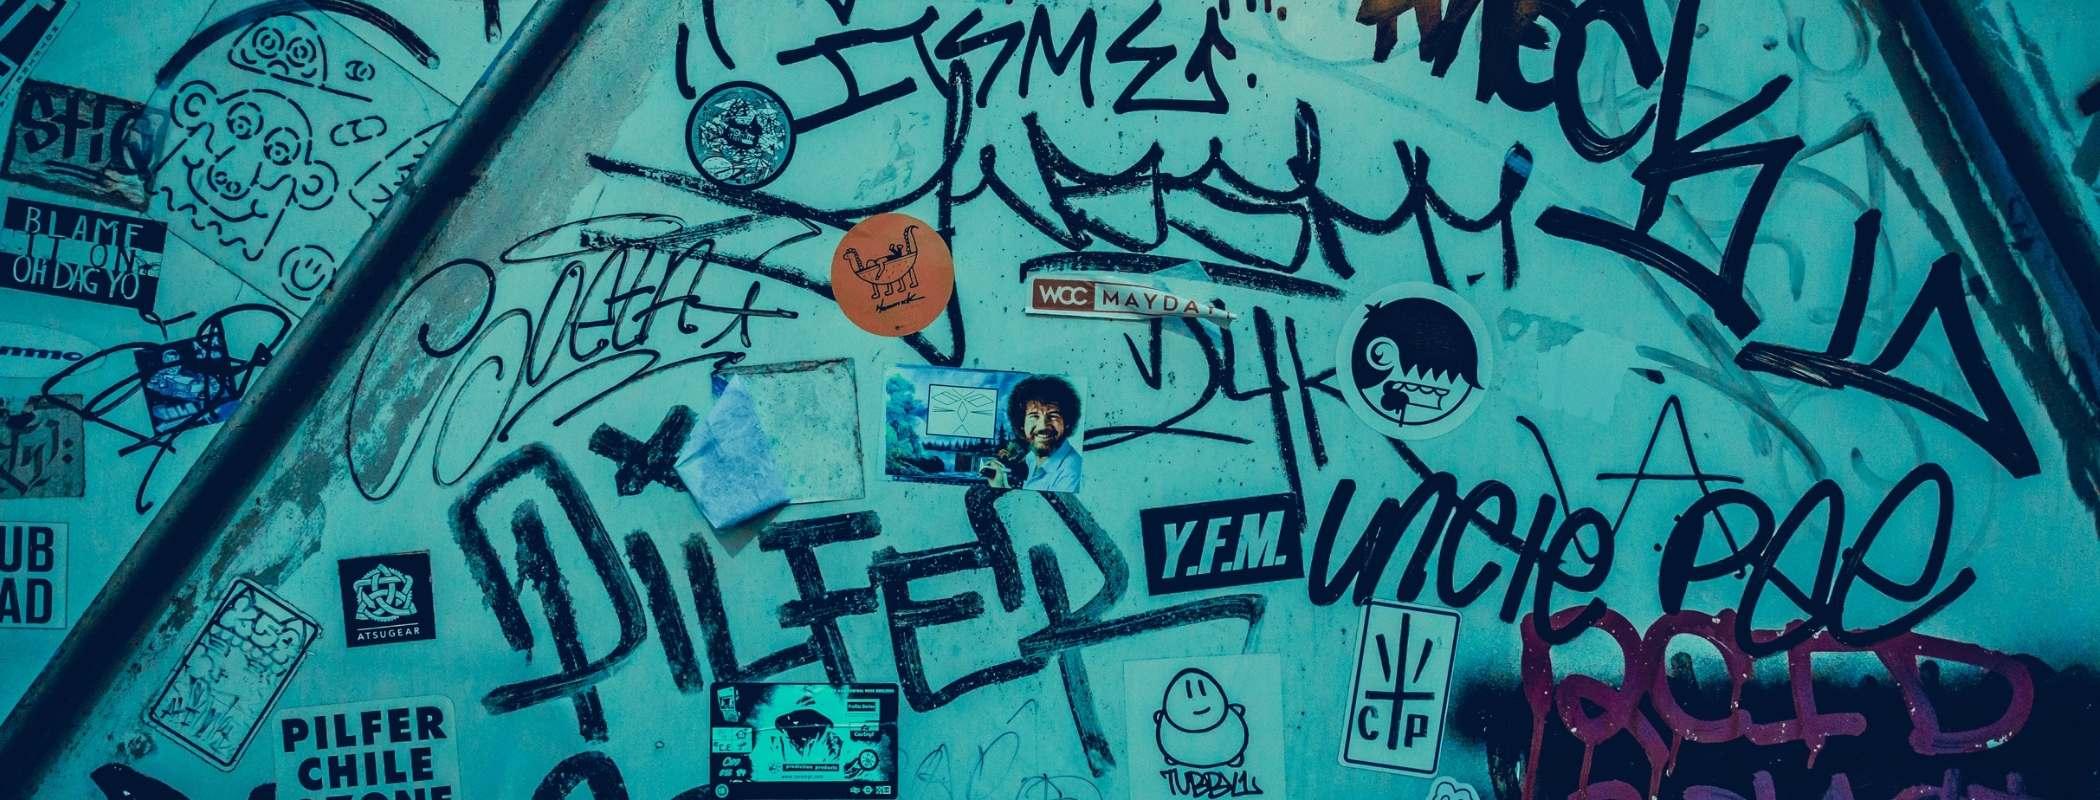 graffiti with pressure washer